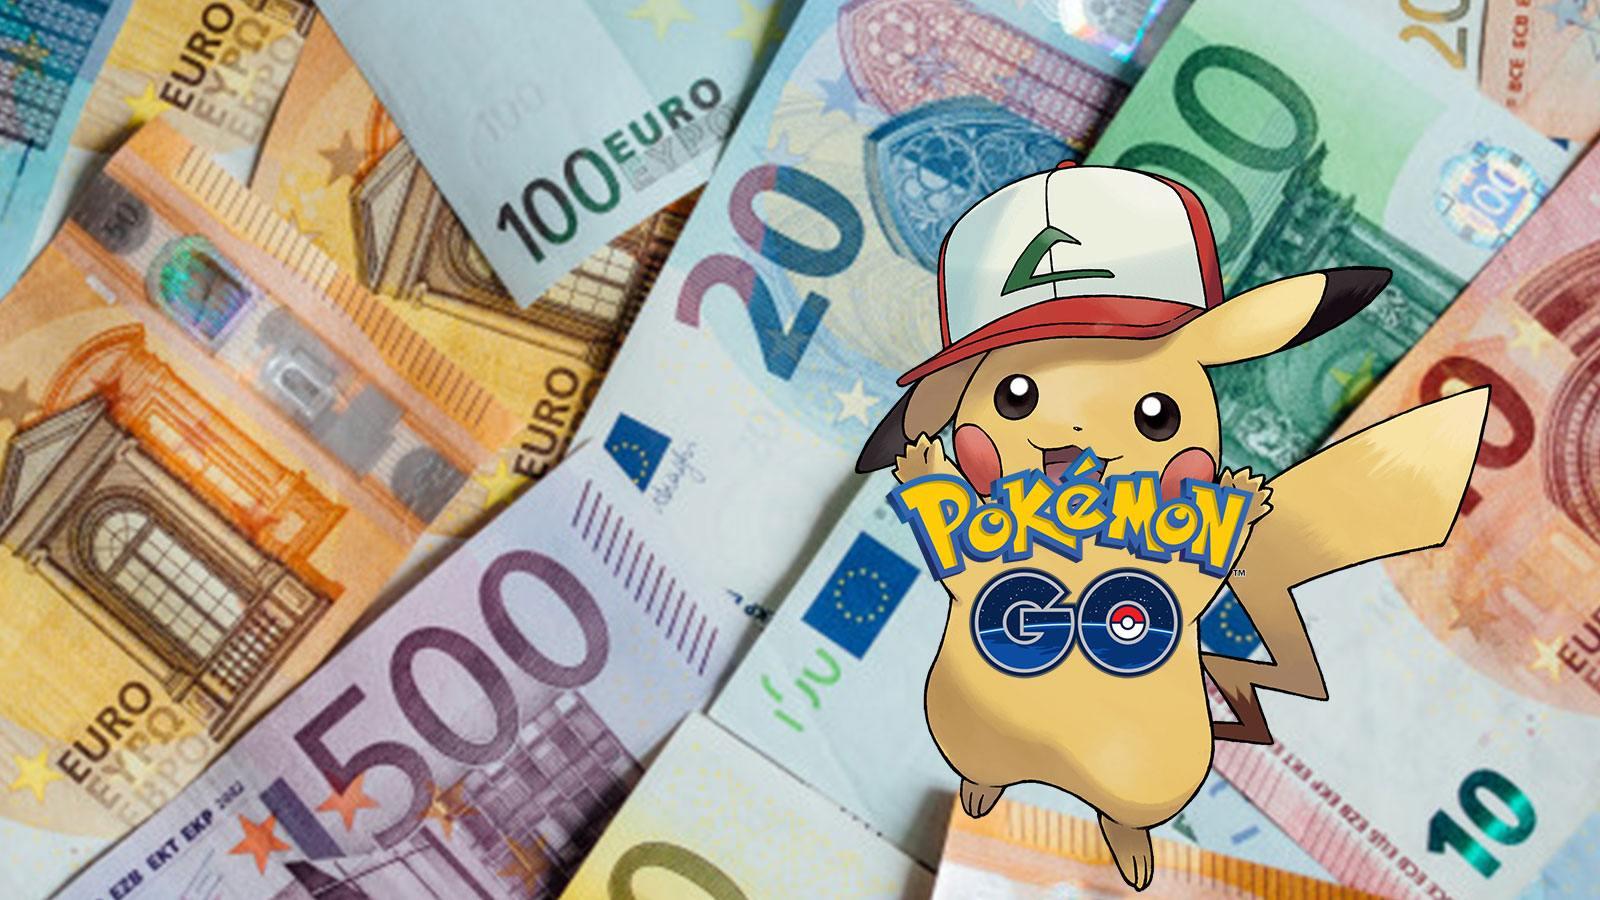 Pokémon Go Pikachu revenus euros Pookémon Company Niantic